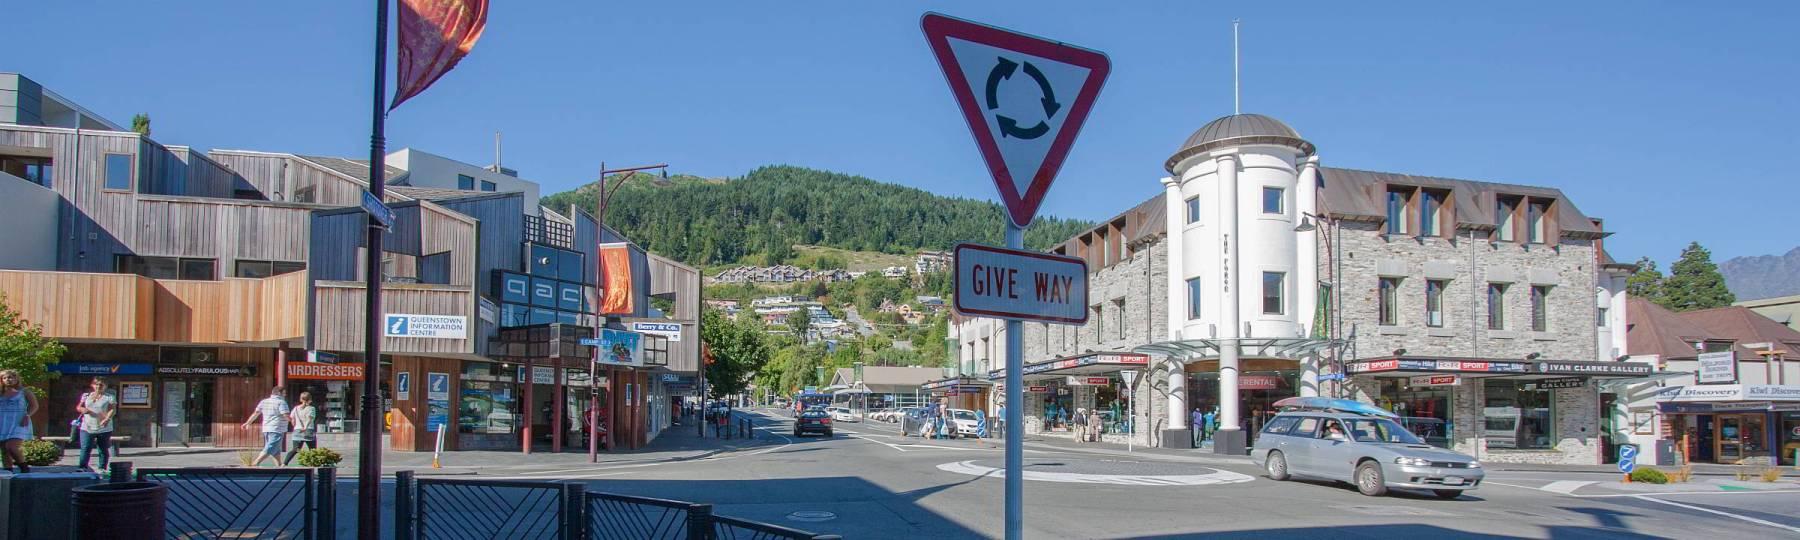 Kreisverkehr auf Neuseeland